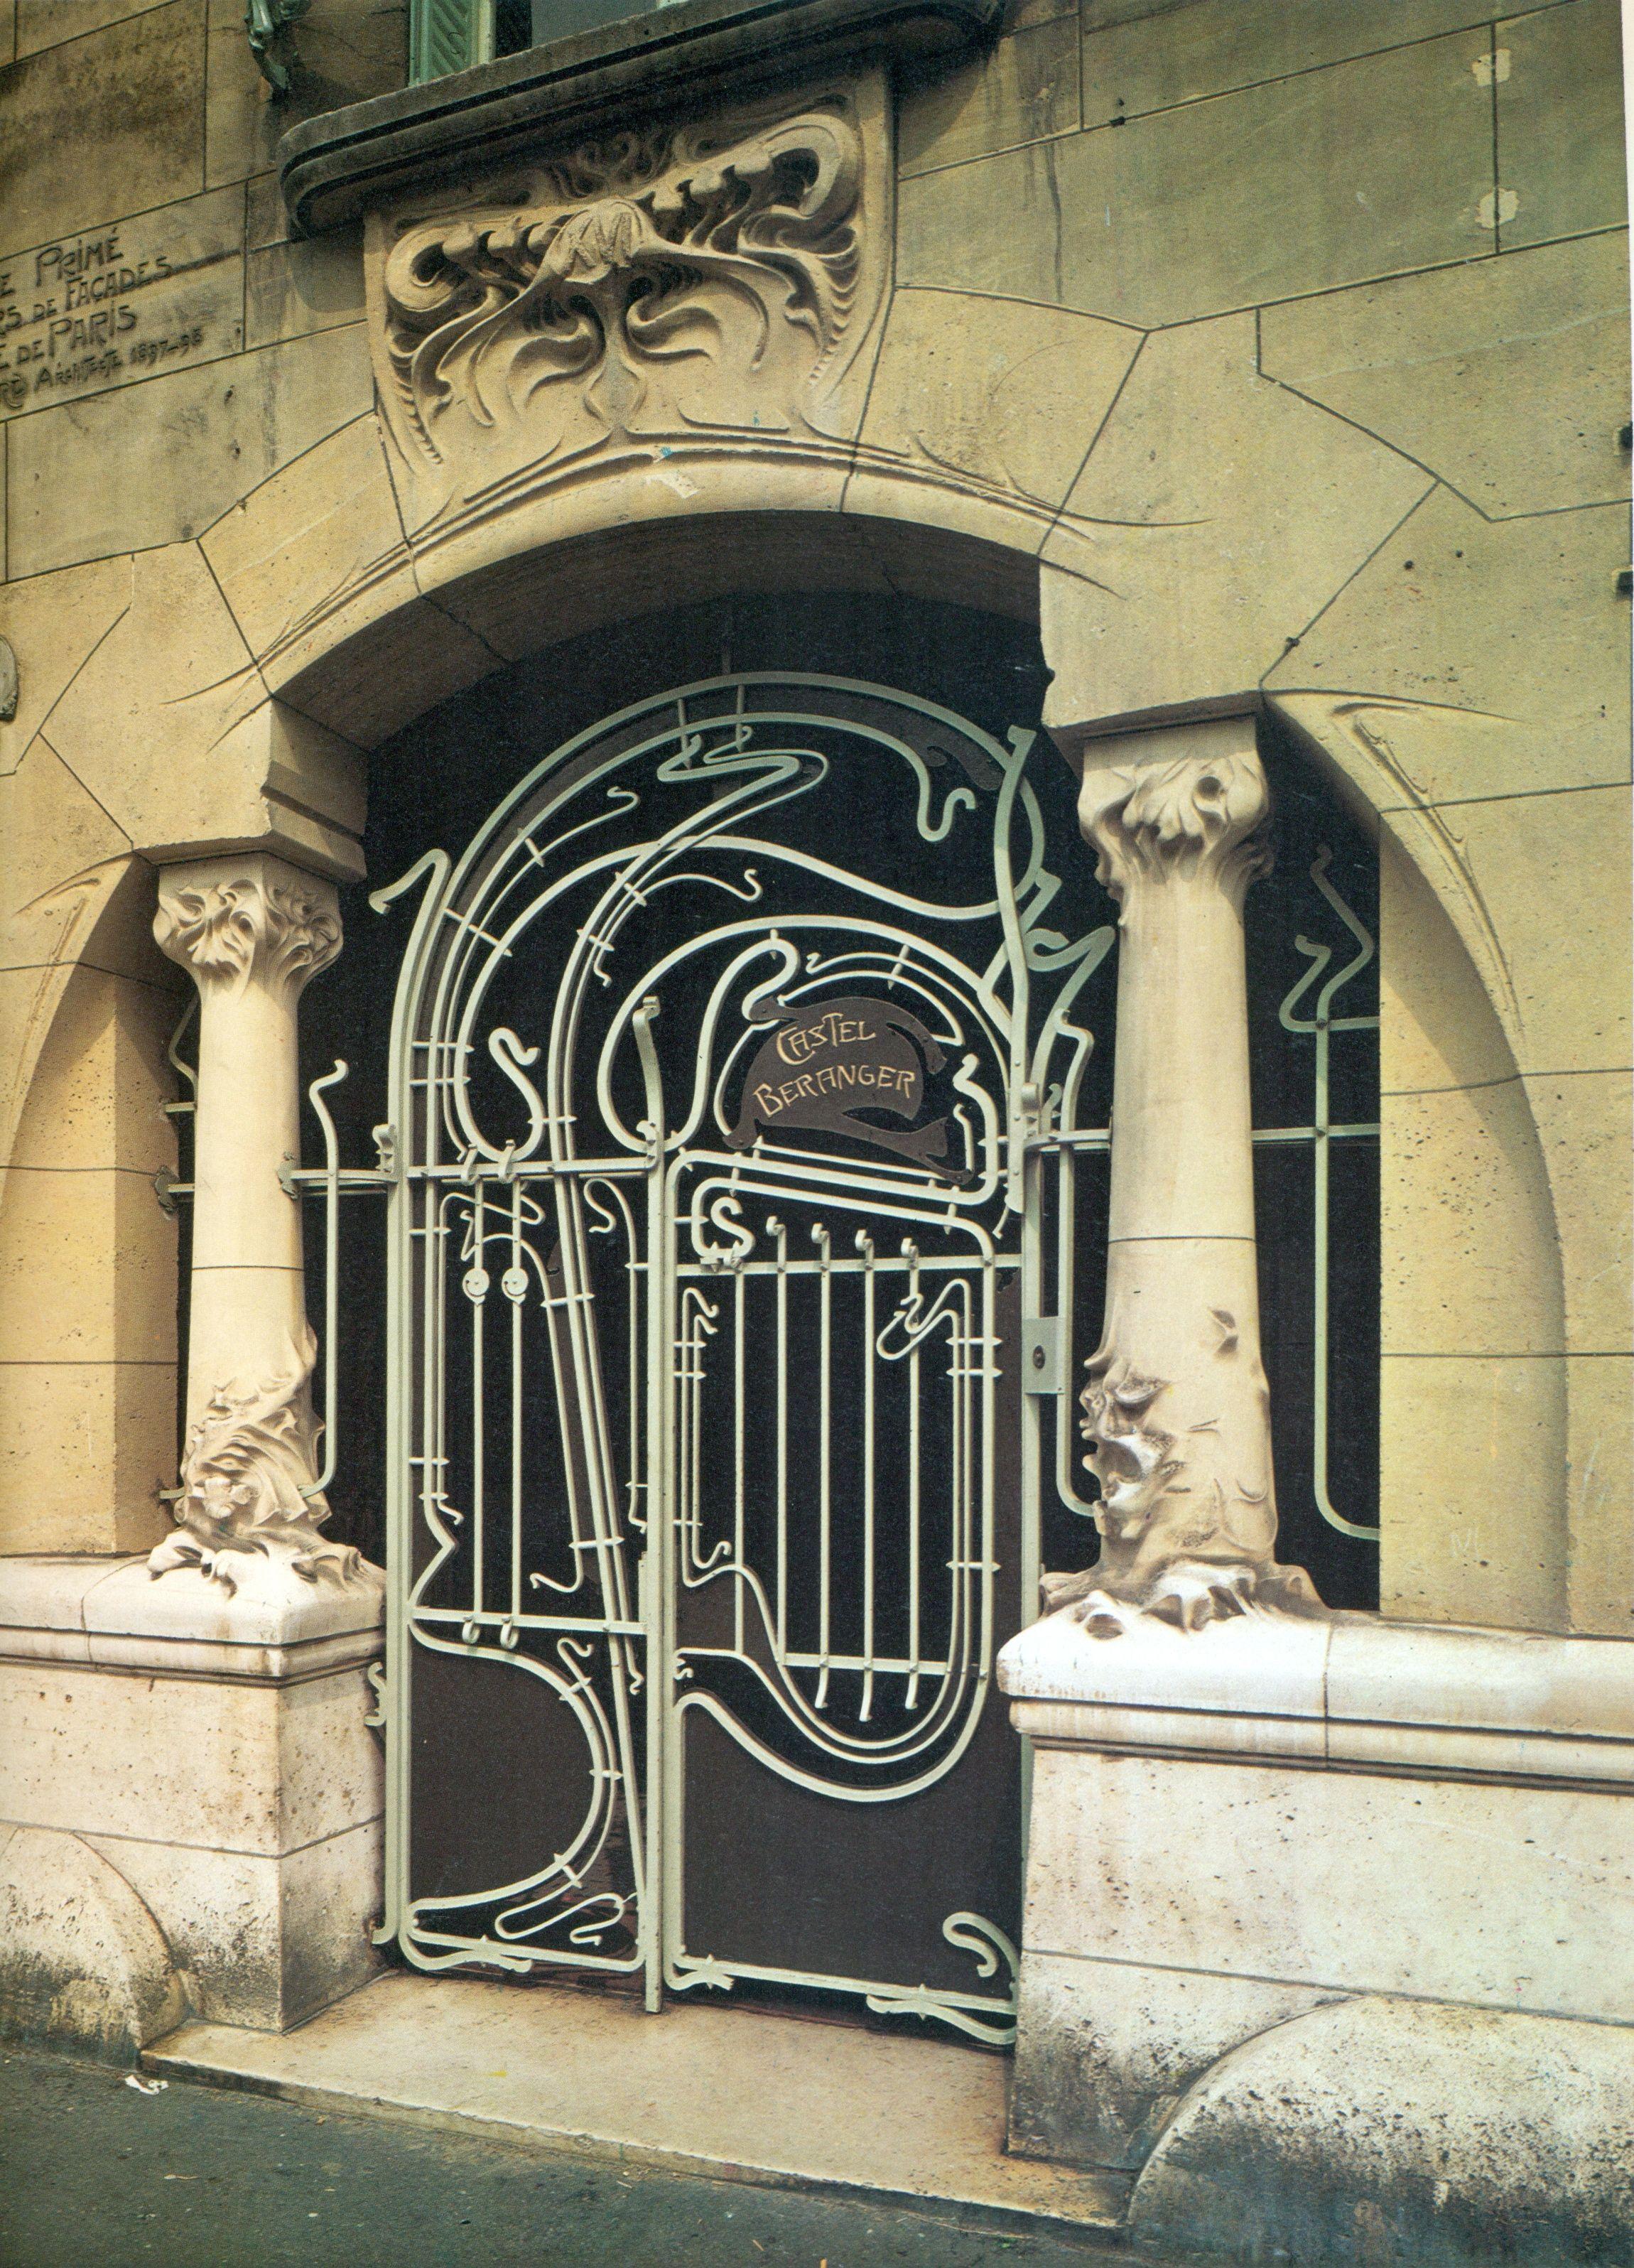 Castel Baranger entry gate in Paris by Hector Guimard. I